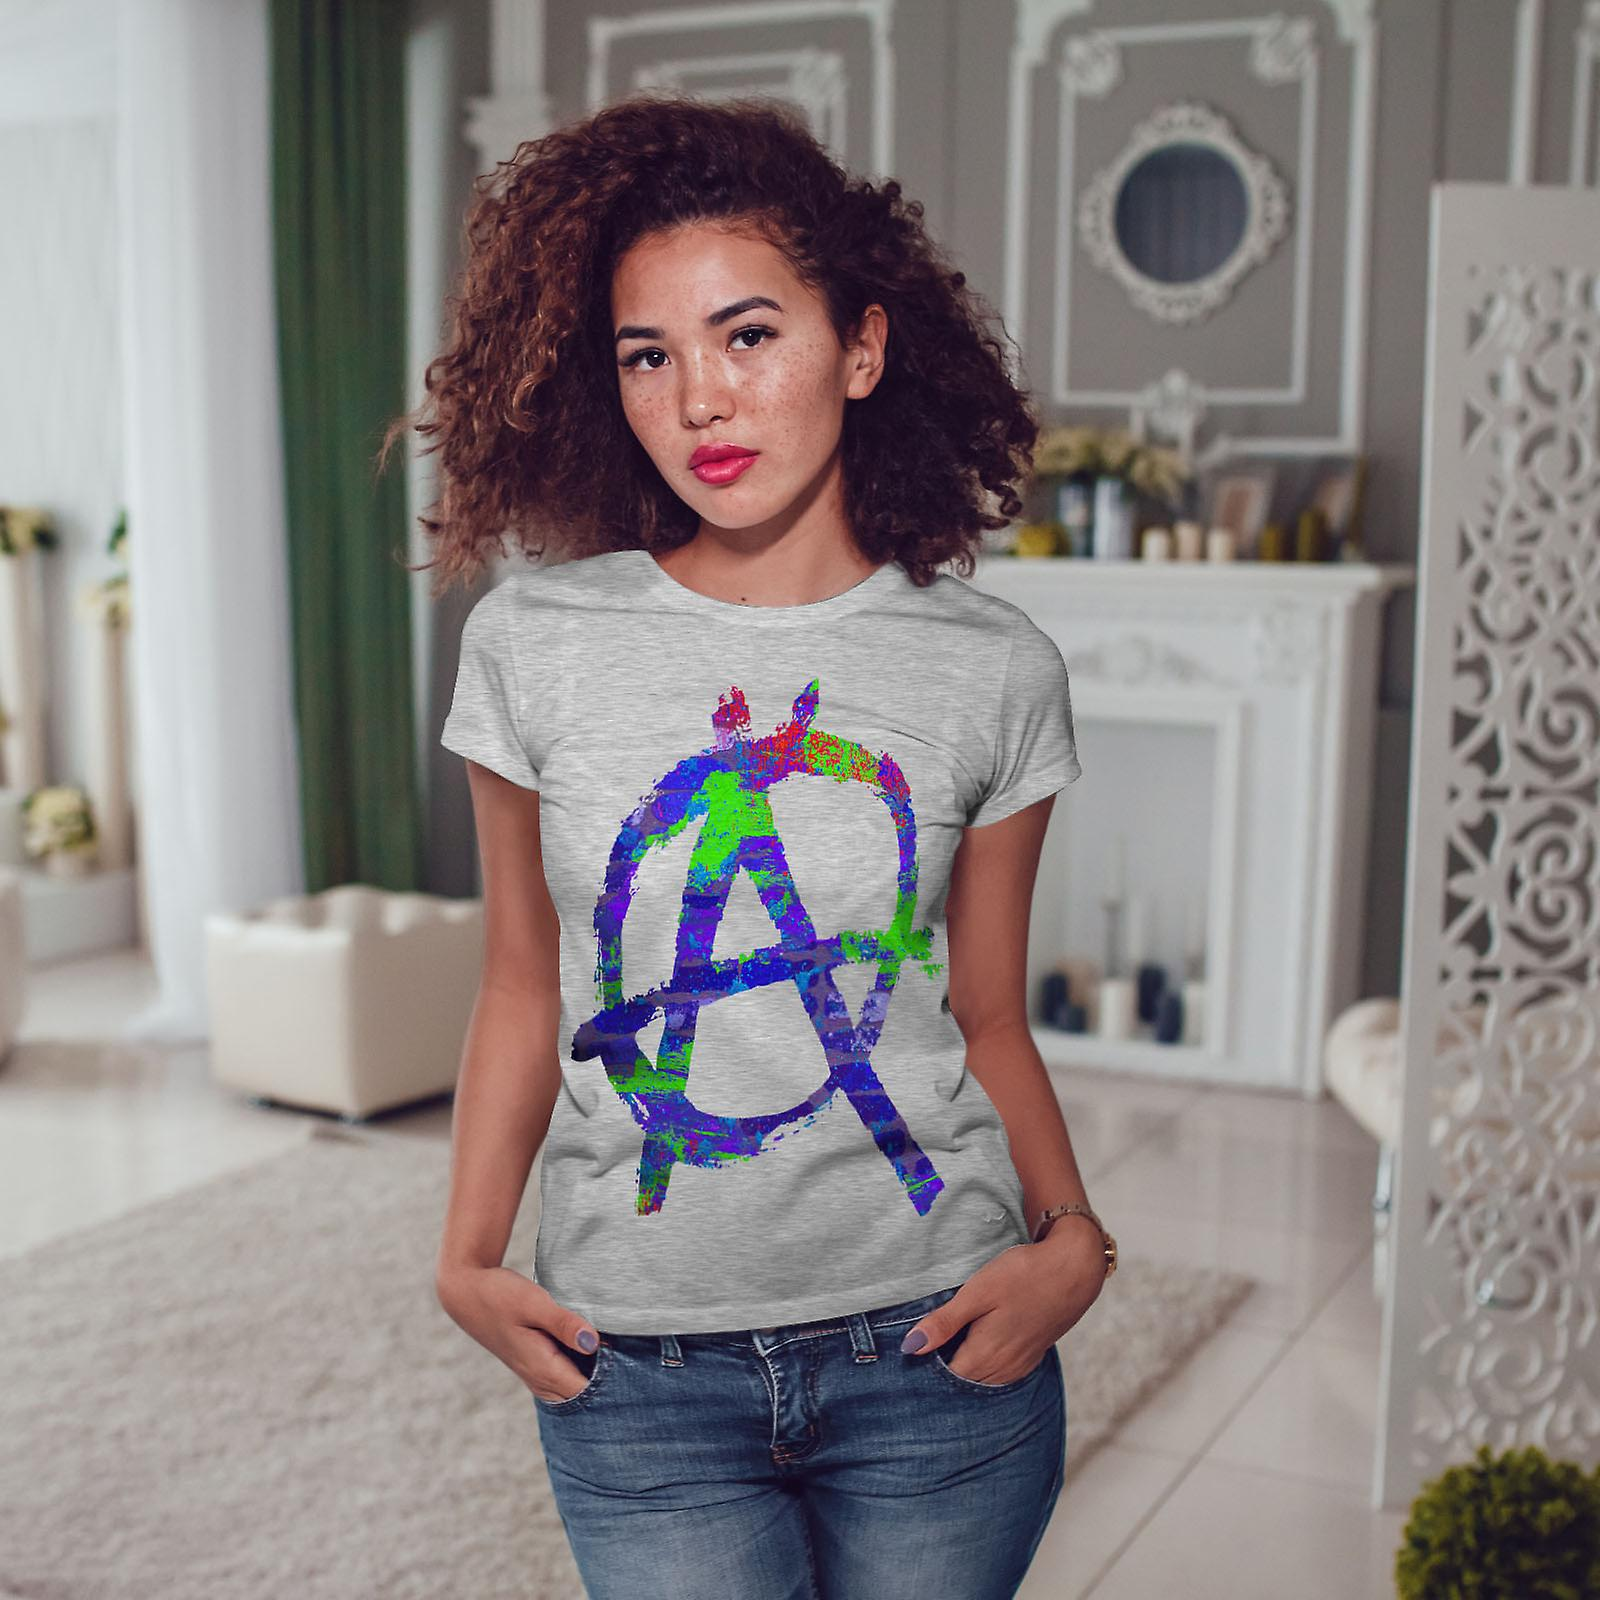 Anarchie symbole couleur GreyT-chemise femme | Wellcoda